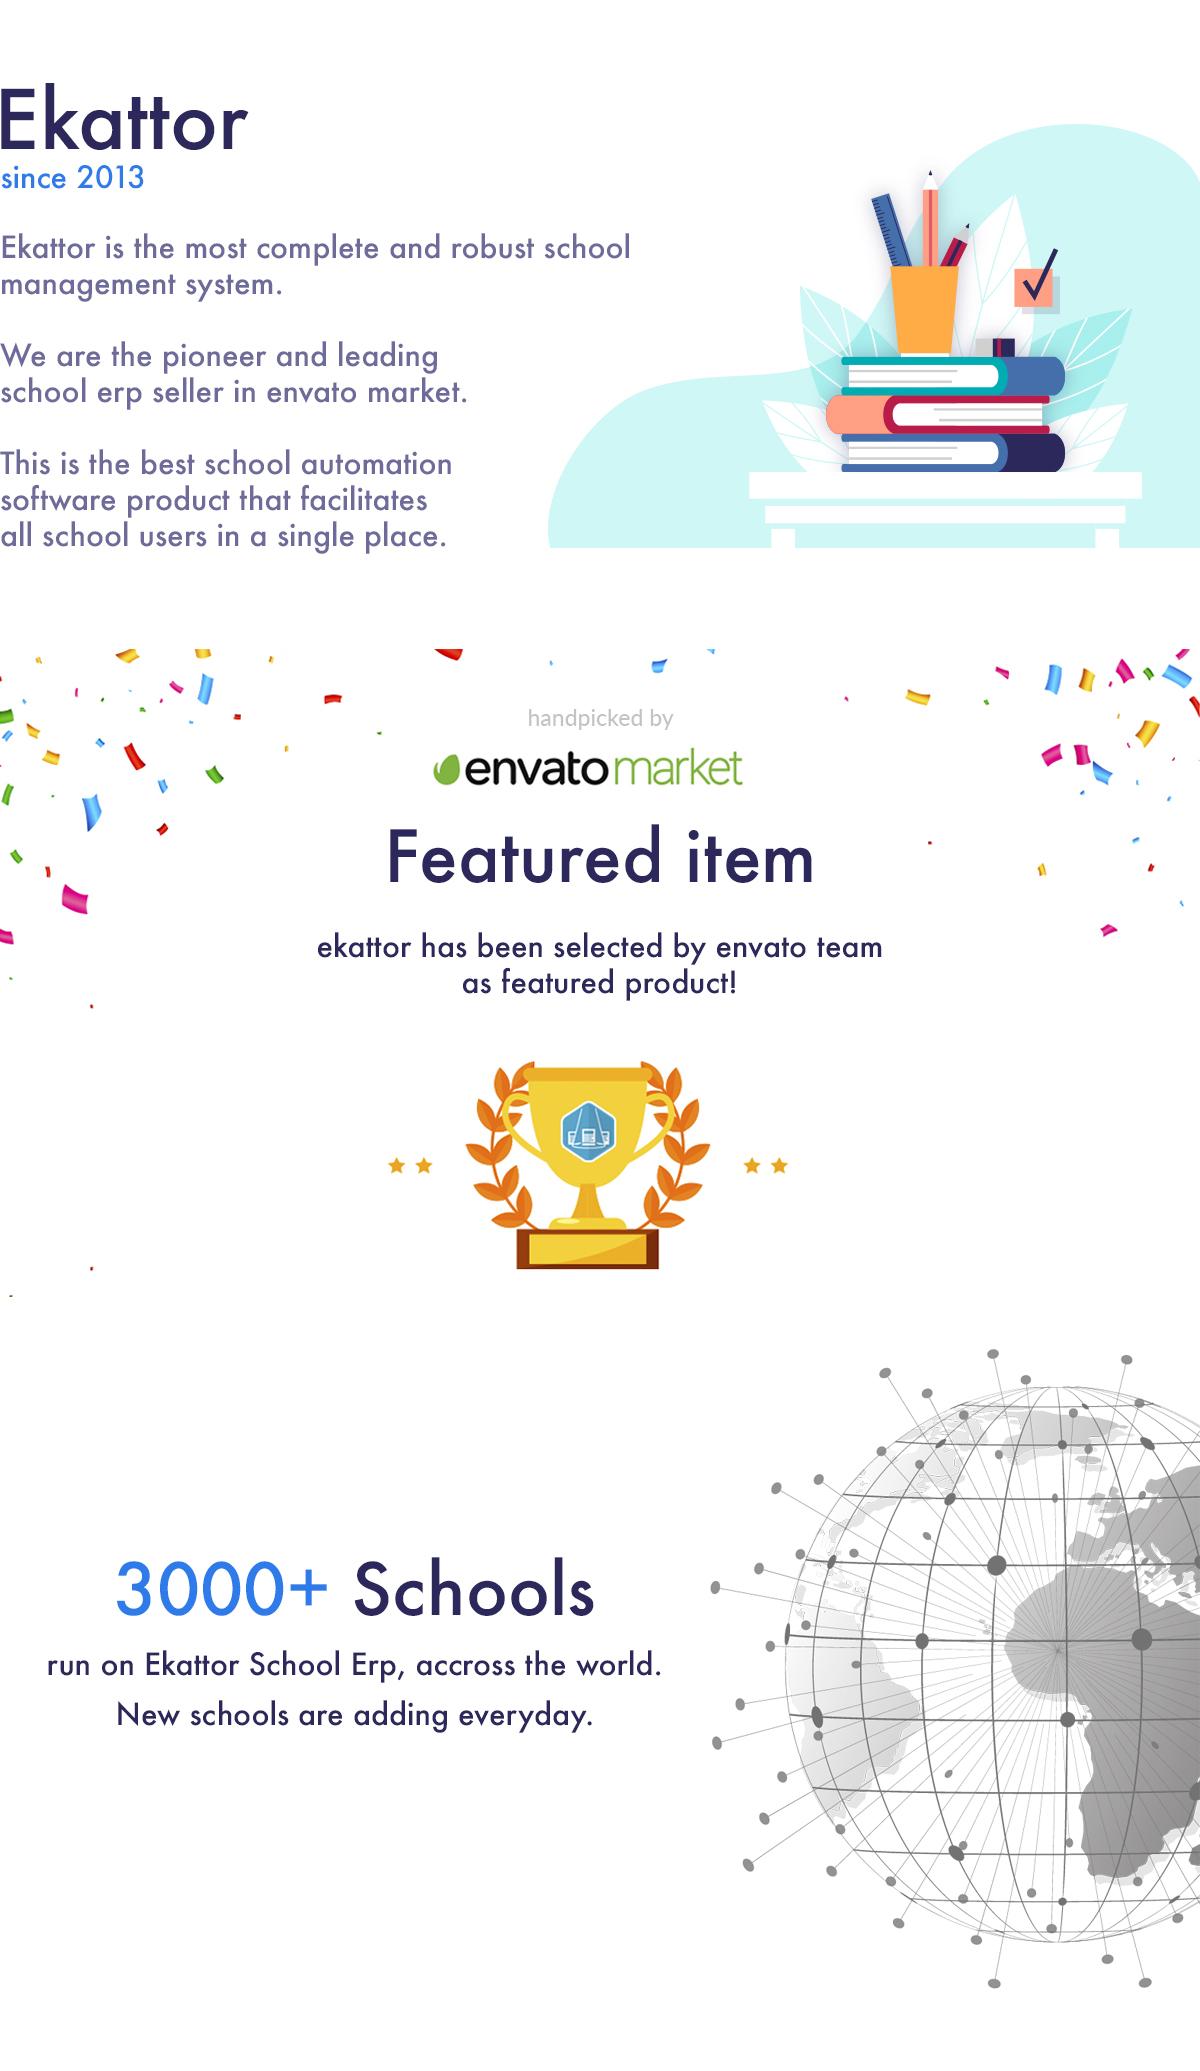 Ekattor School Management System - 3